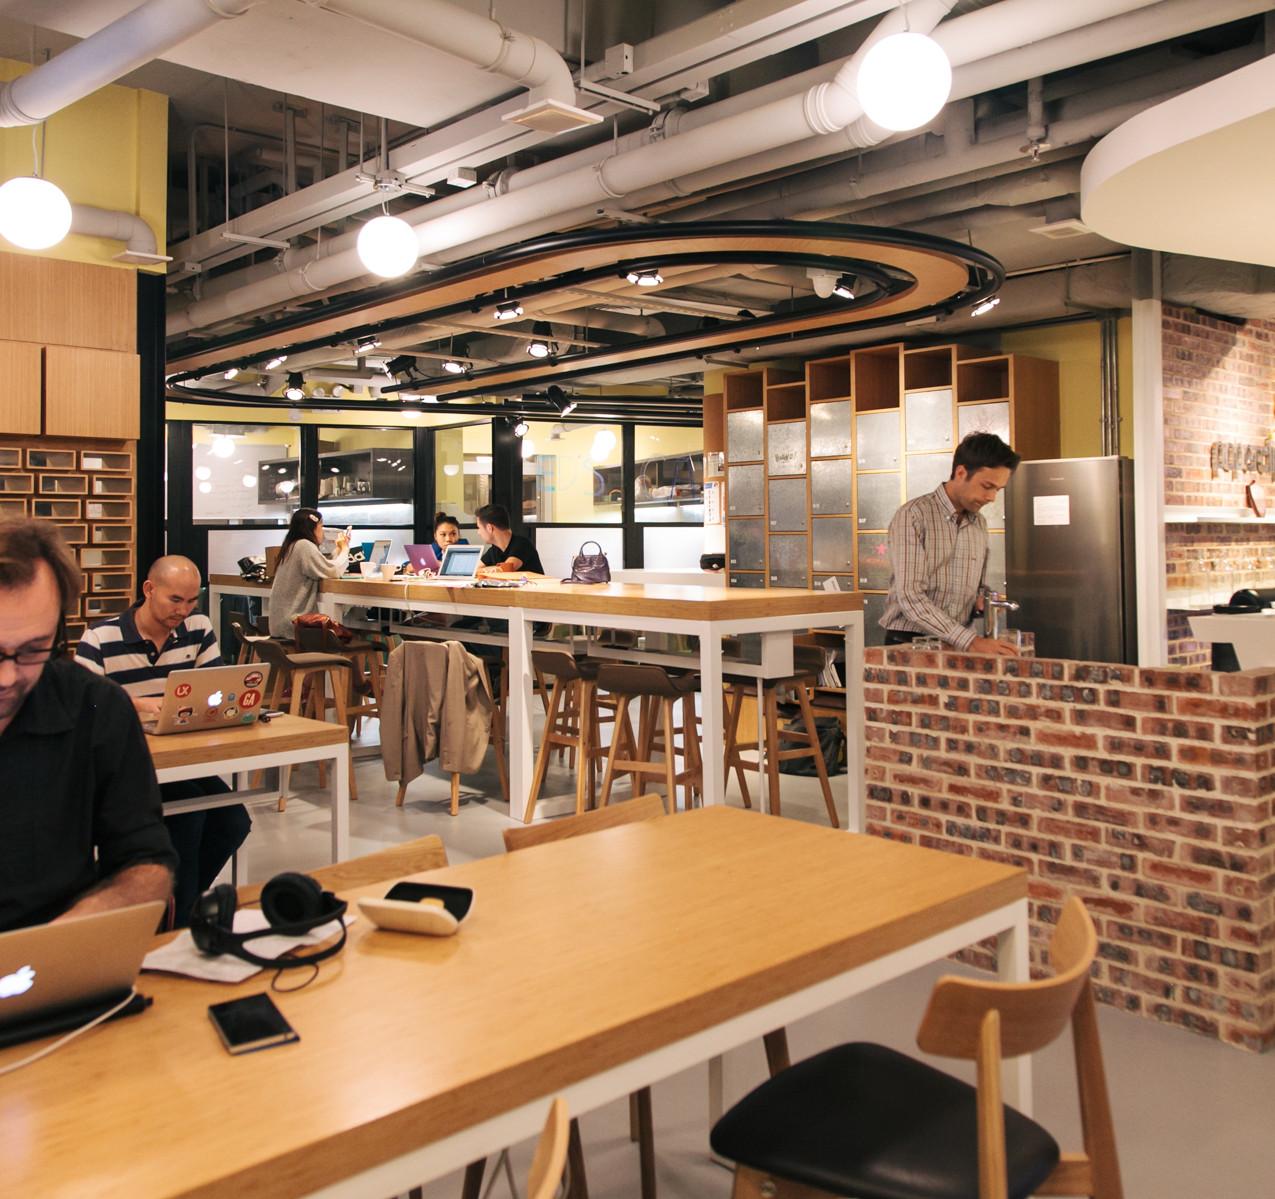 Pic 14 - Paperclip_s hot desks